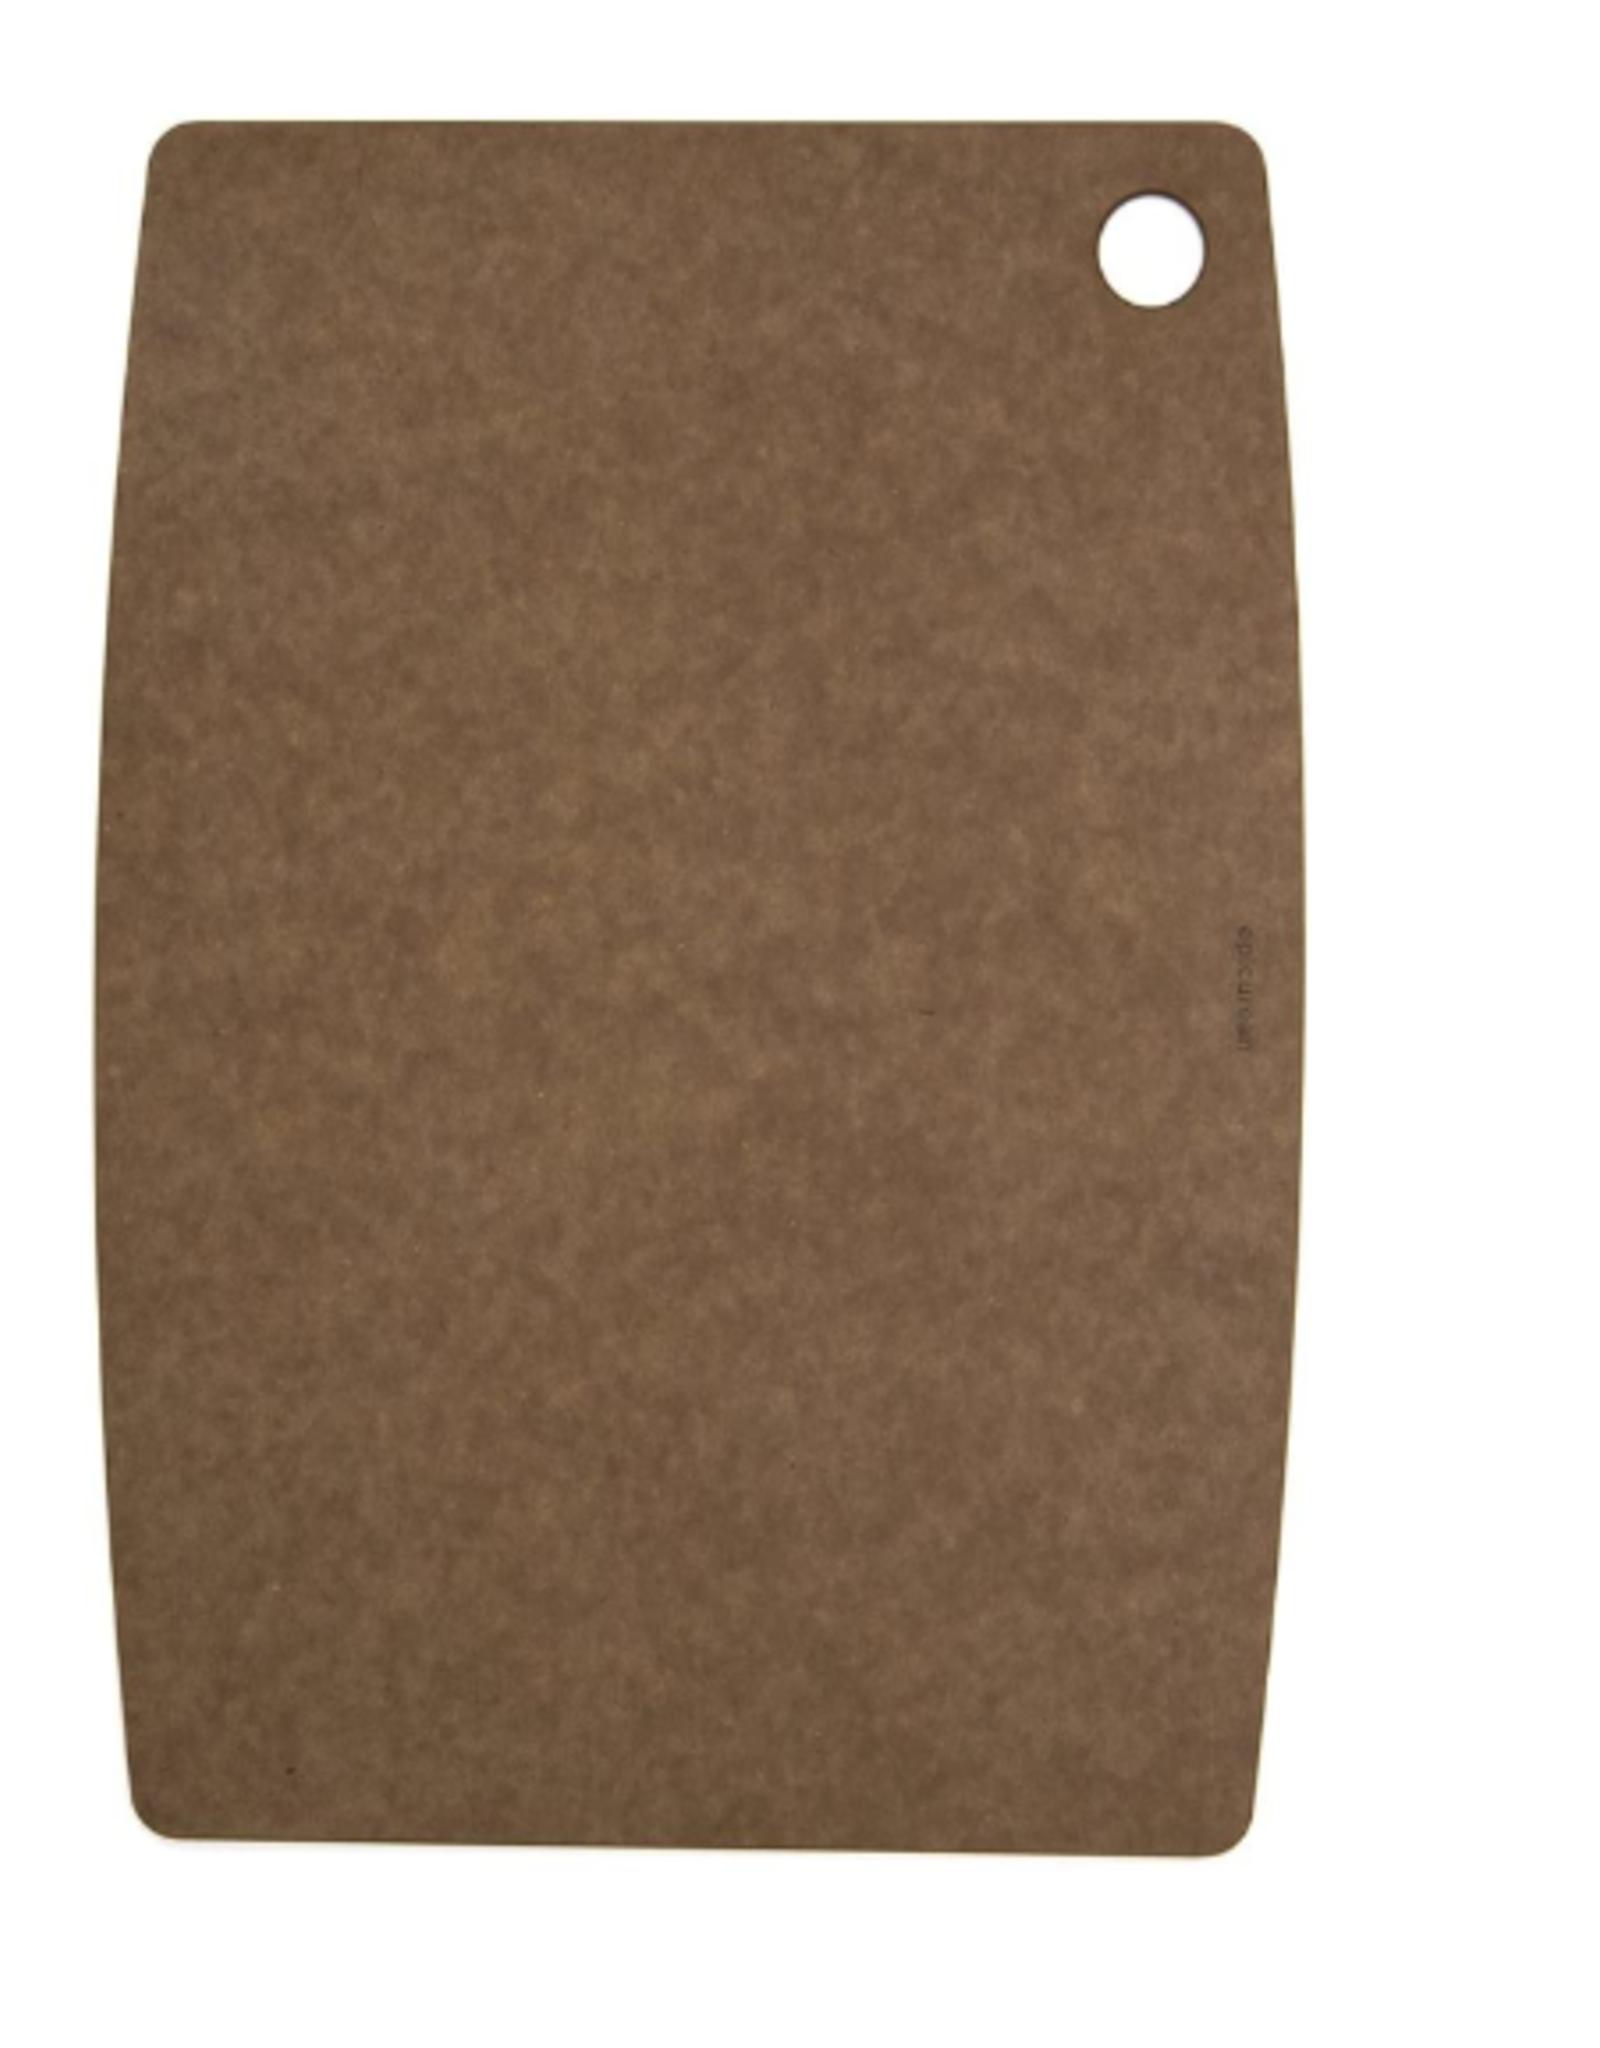 Epicurean Epicurean KS 18X13 Nutmeg Cutting Board